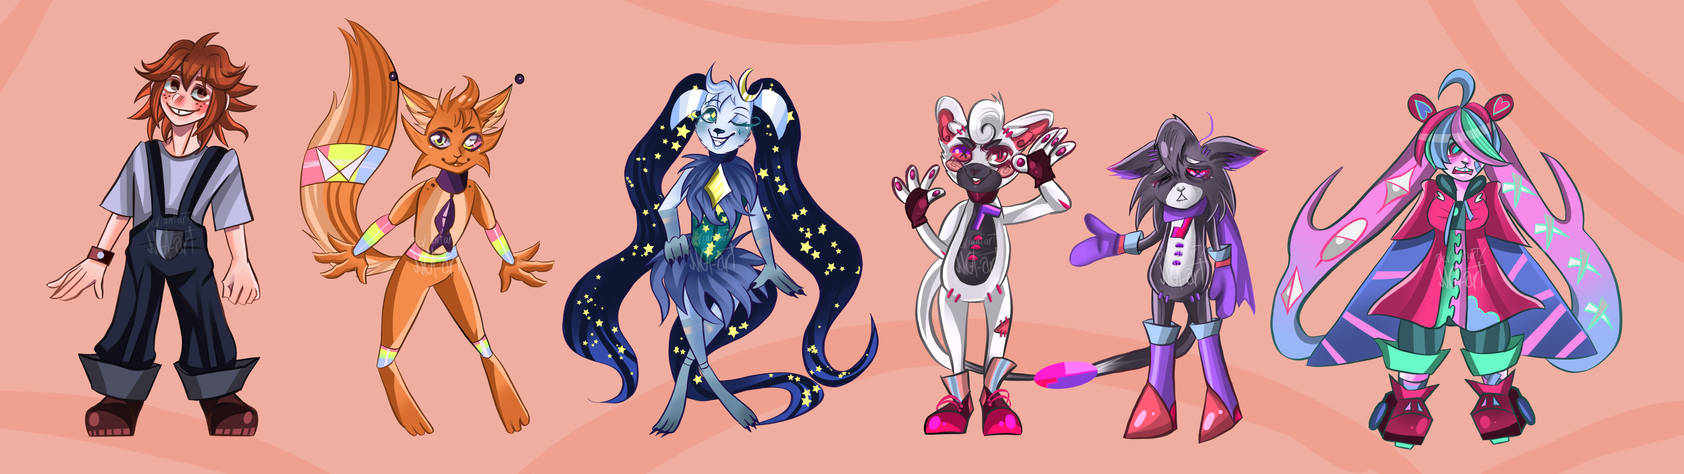 Hideaway characters 1/3